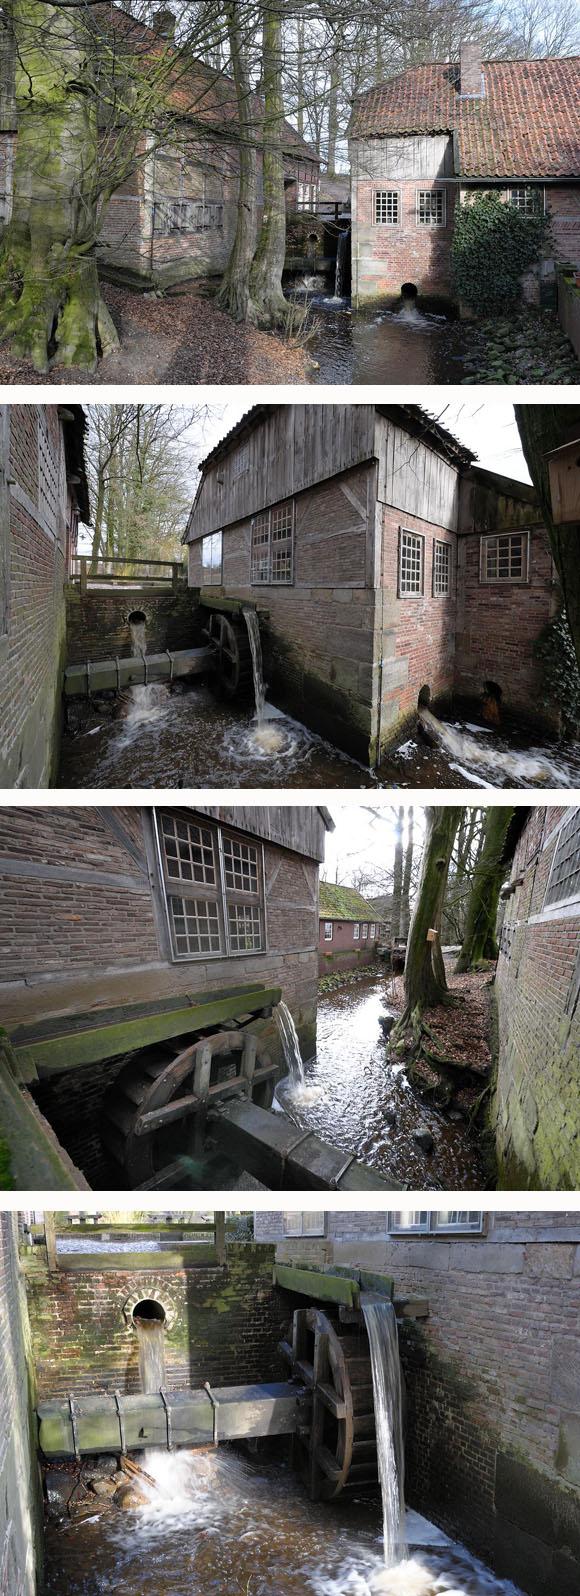 Watermolen Bels, Mander, Eddy Blenke (01-03-2010) | Database Nederlandse molens